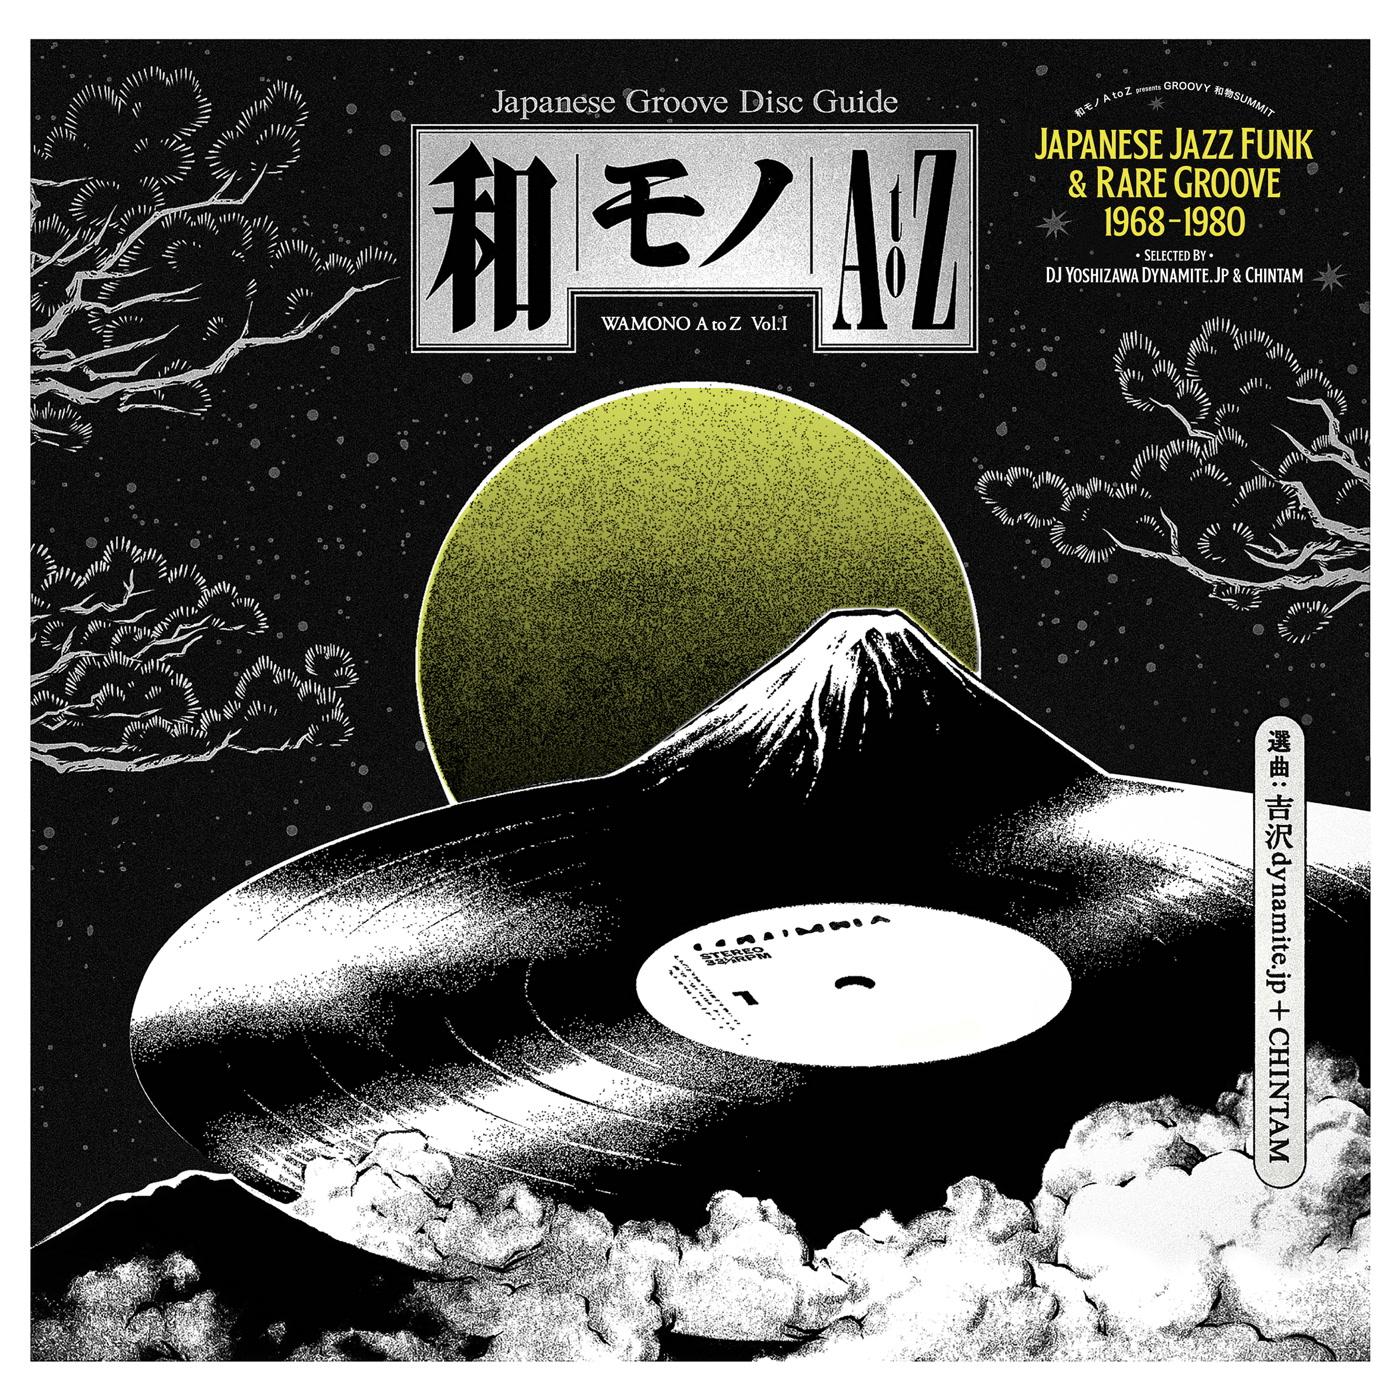 Various Artists – WAMONO A to Z Vol. I – Japanese Jazz Funk & Rare Groove 1968-1980 (Selected by DJ Yoshizawa Dynamite & Chintam) (180g)